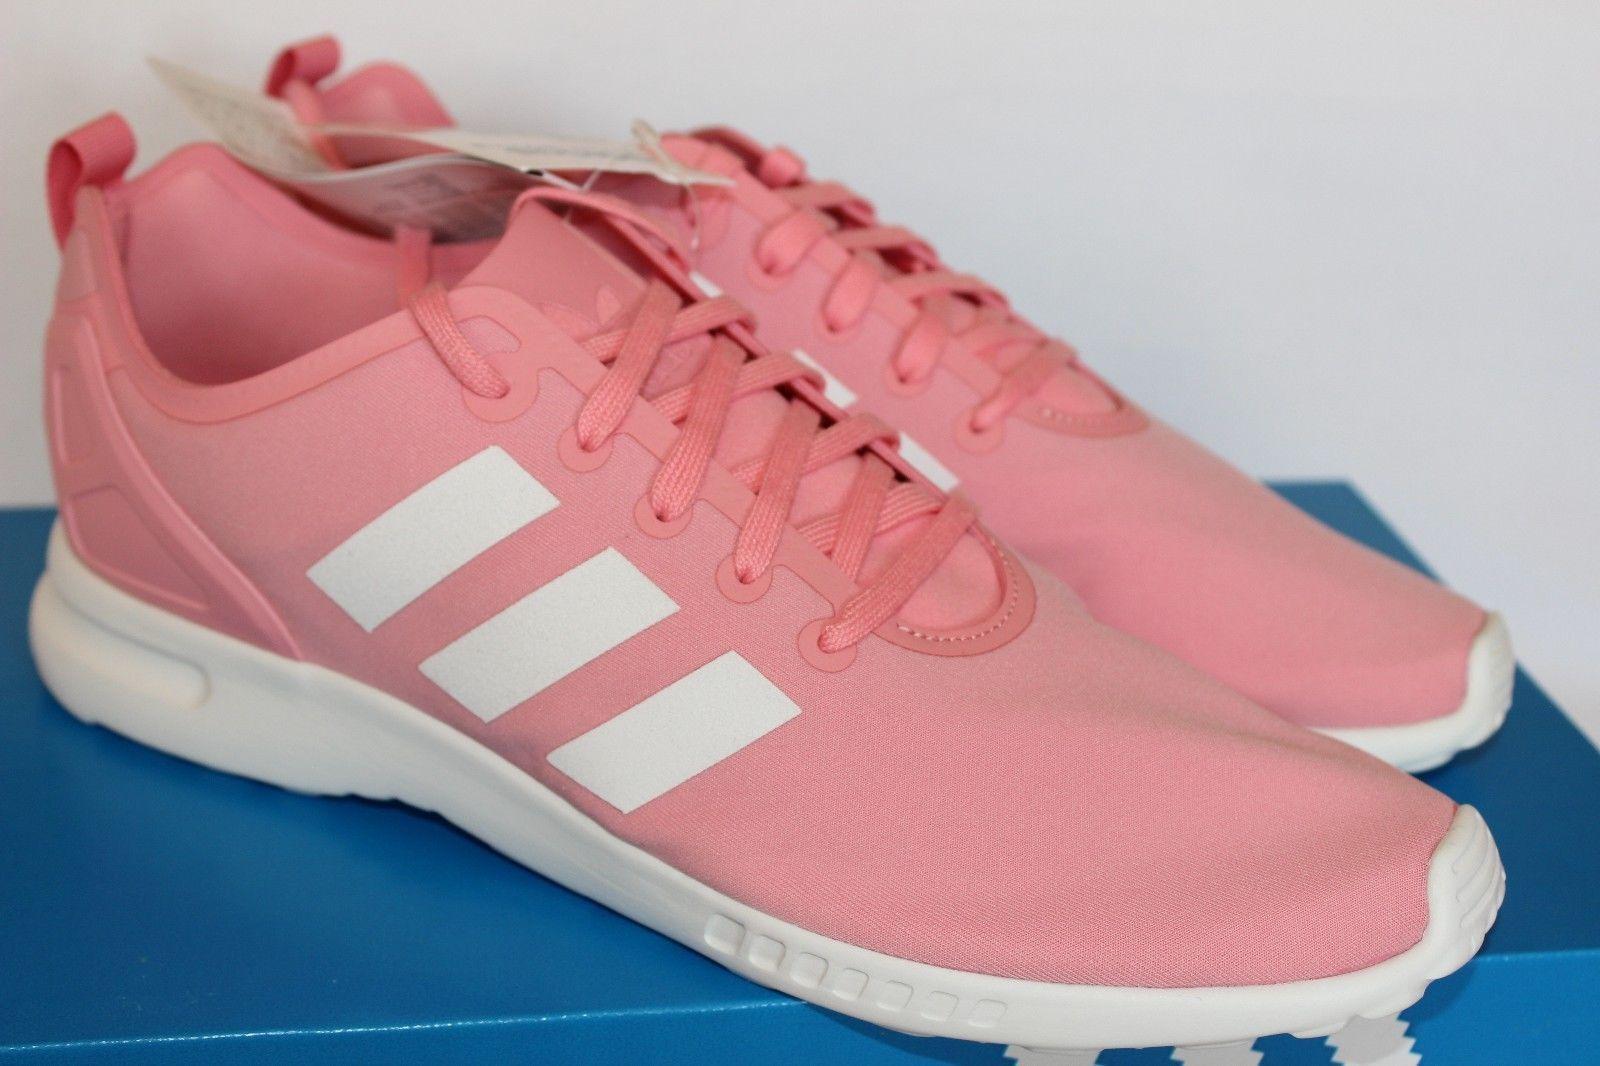 Adidas ZX Flux Smooth W 40 Sneaker Sportschuhe rosa weiß 40 W 2/3 Original & Neu Rar 6a9683